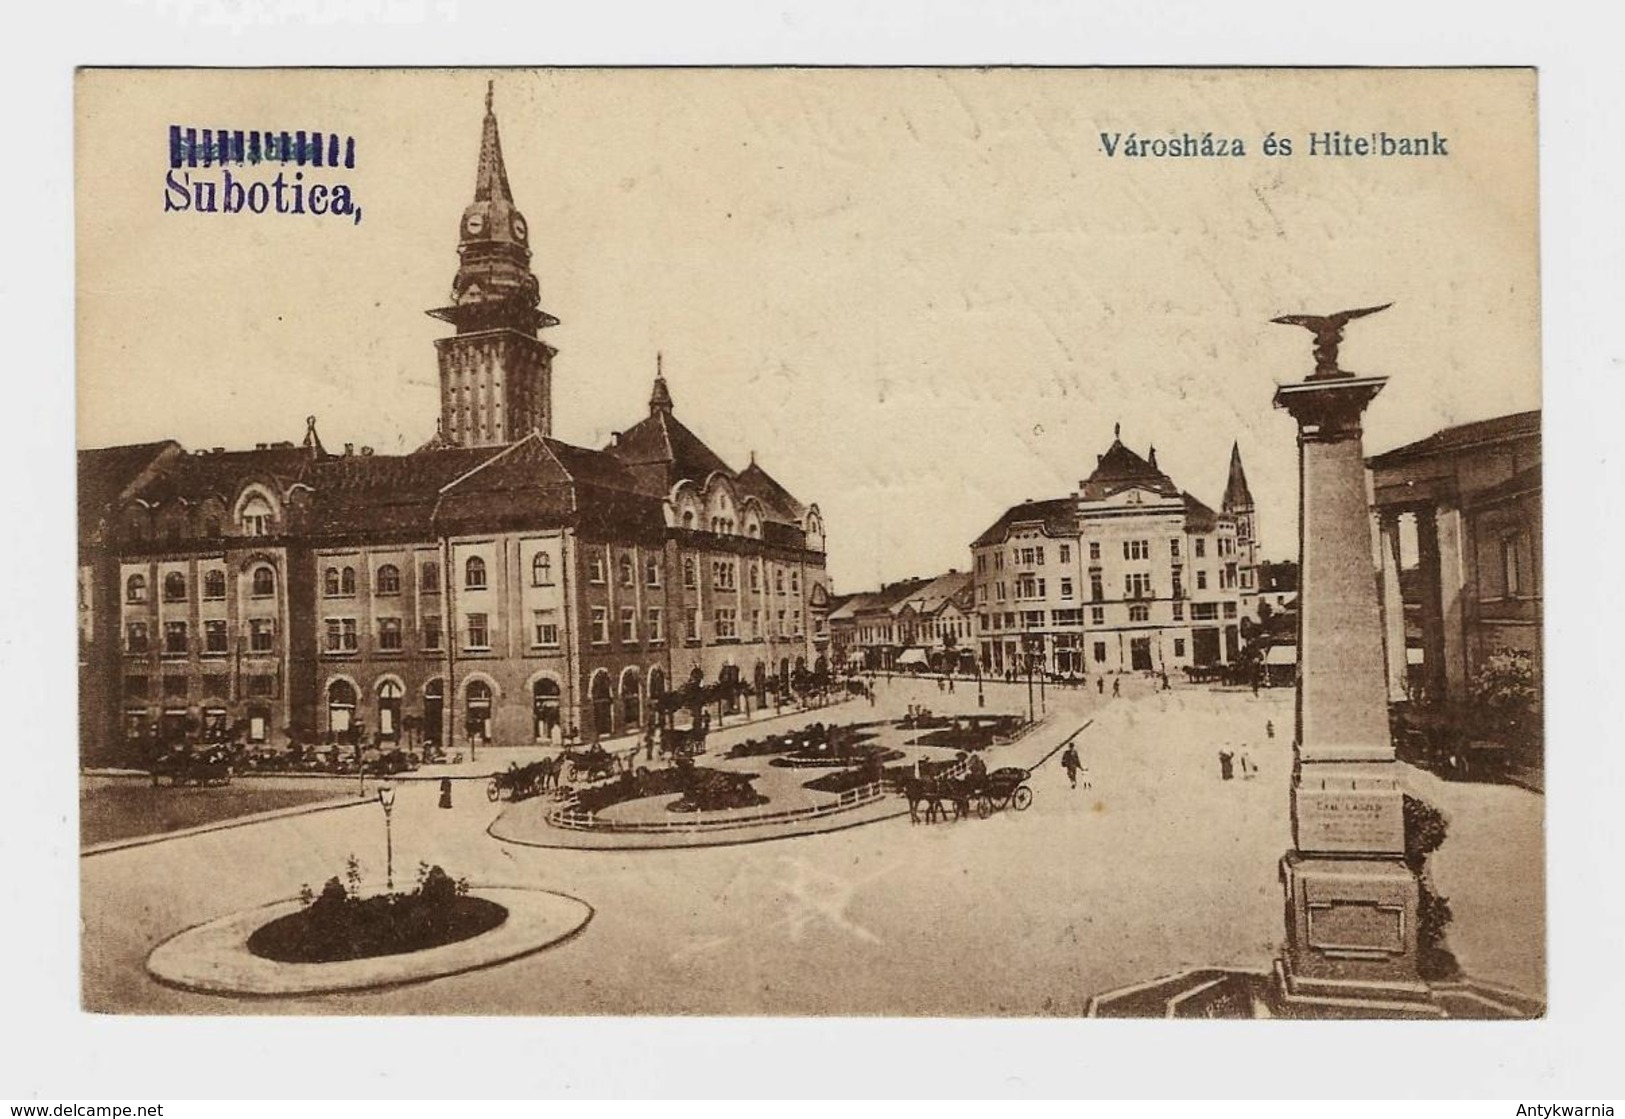 Szabadka, Subotica, Varoshaza Es Hitelbank  1921y.   D185 - Serbia